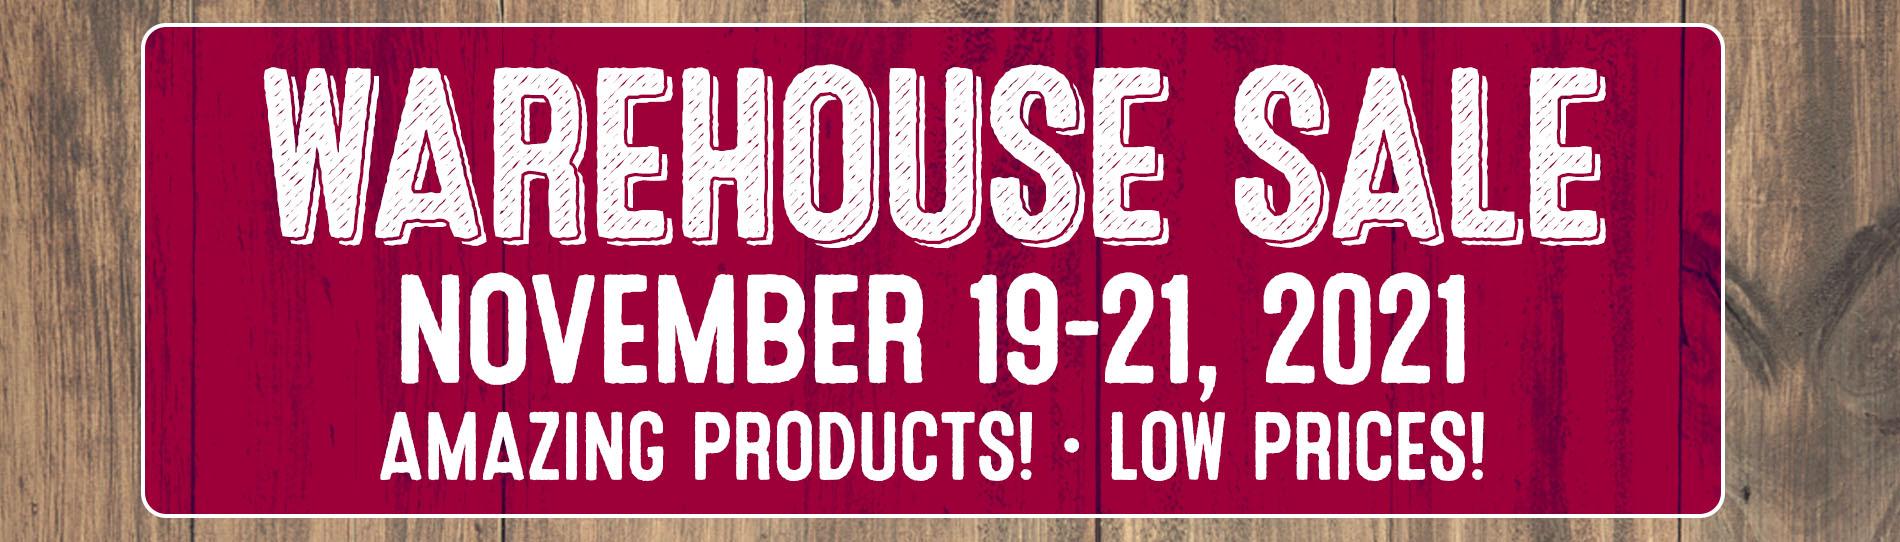 Warehouse Sale November 19 - 21 banner